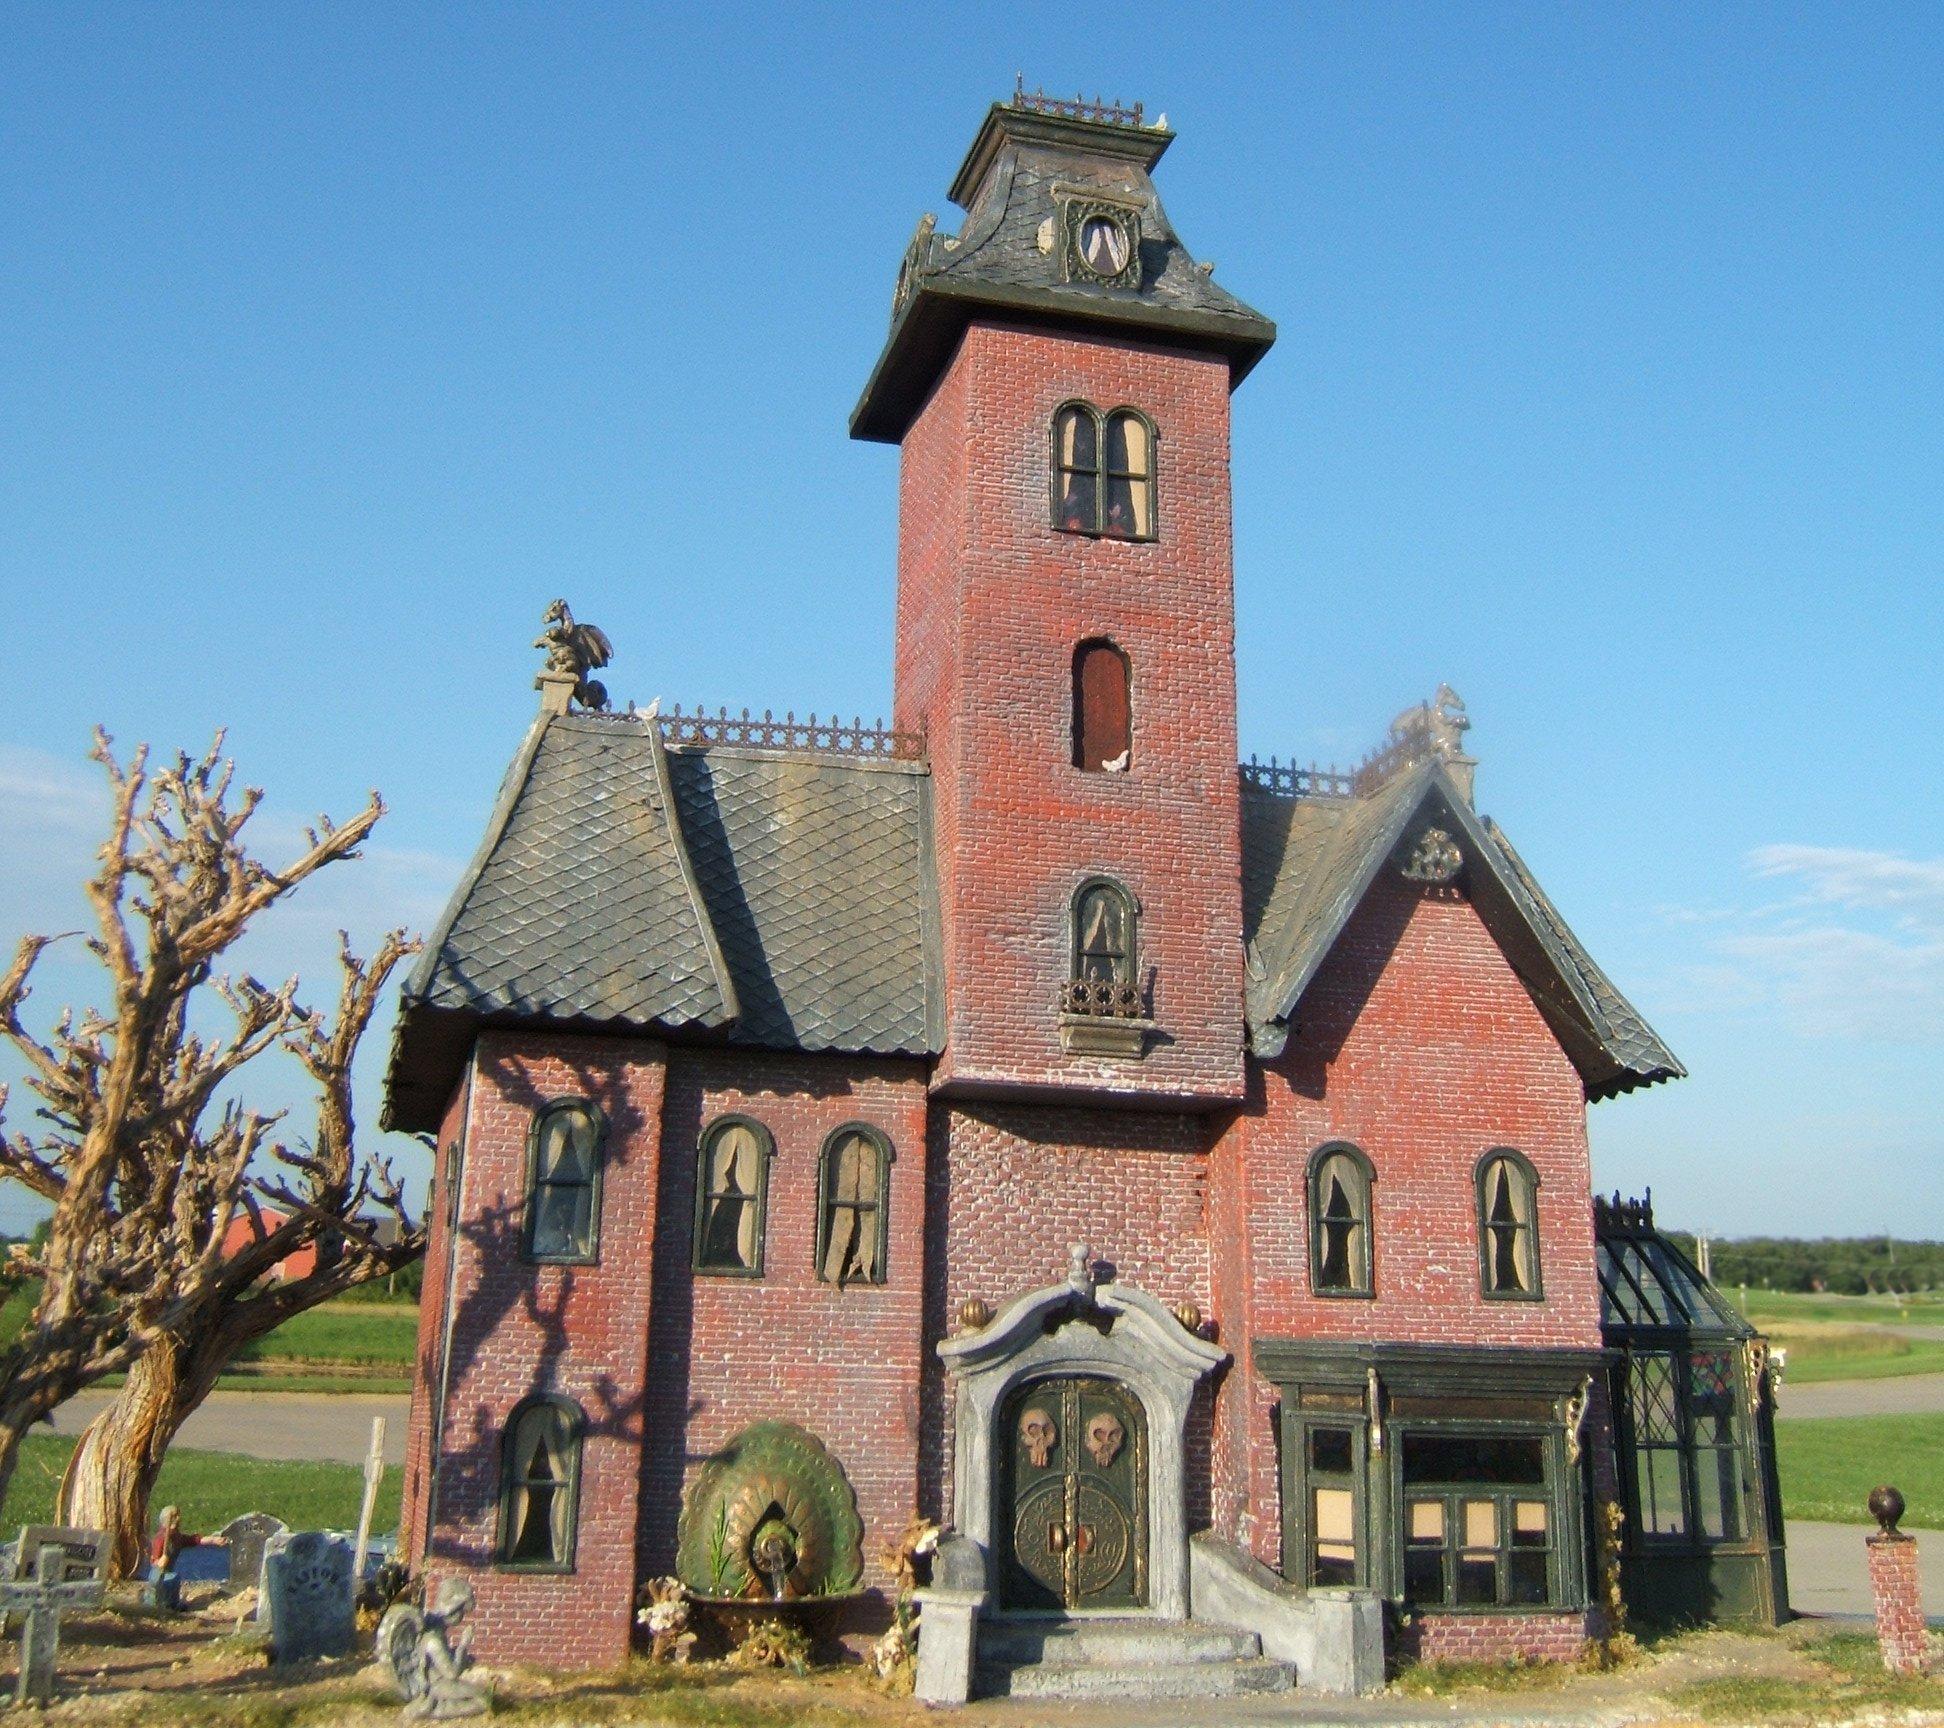 Grimm's Mansion